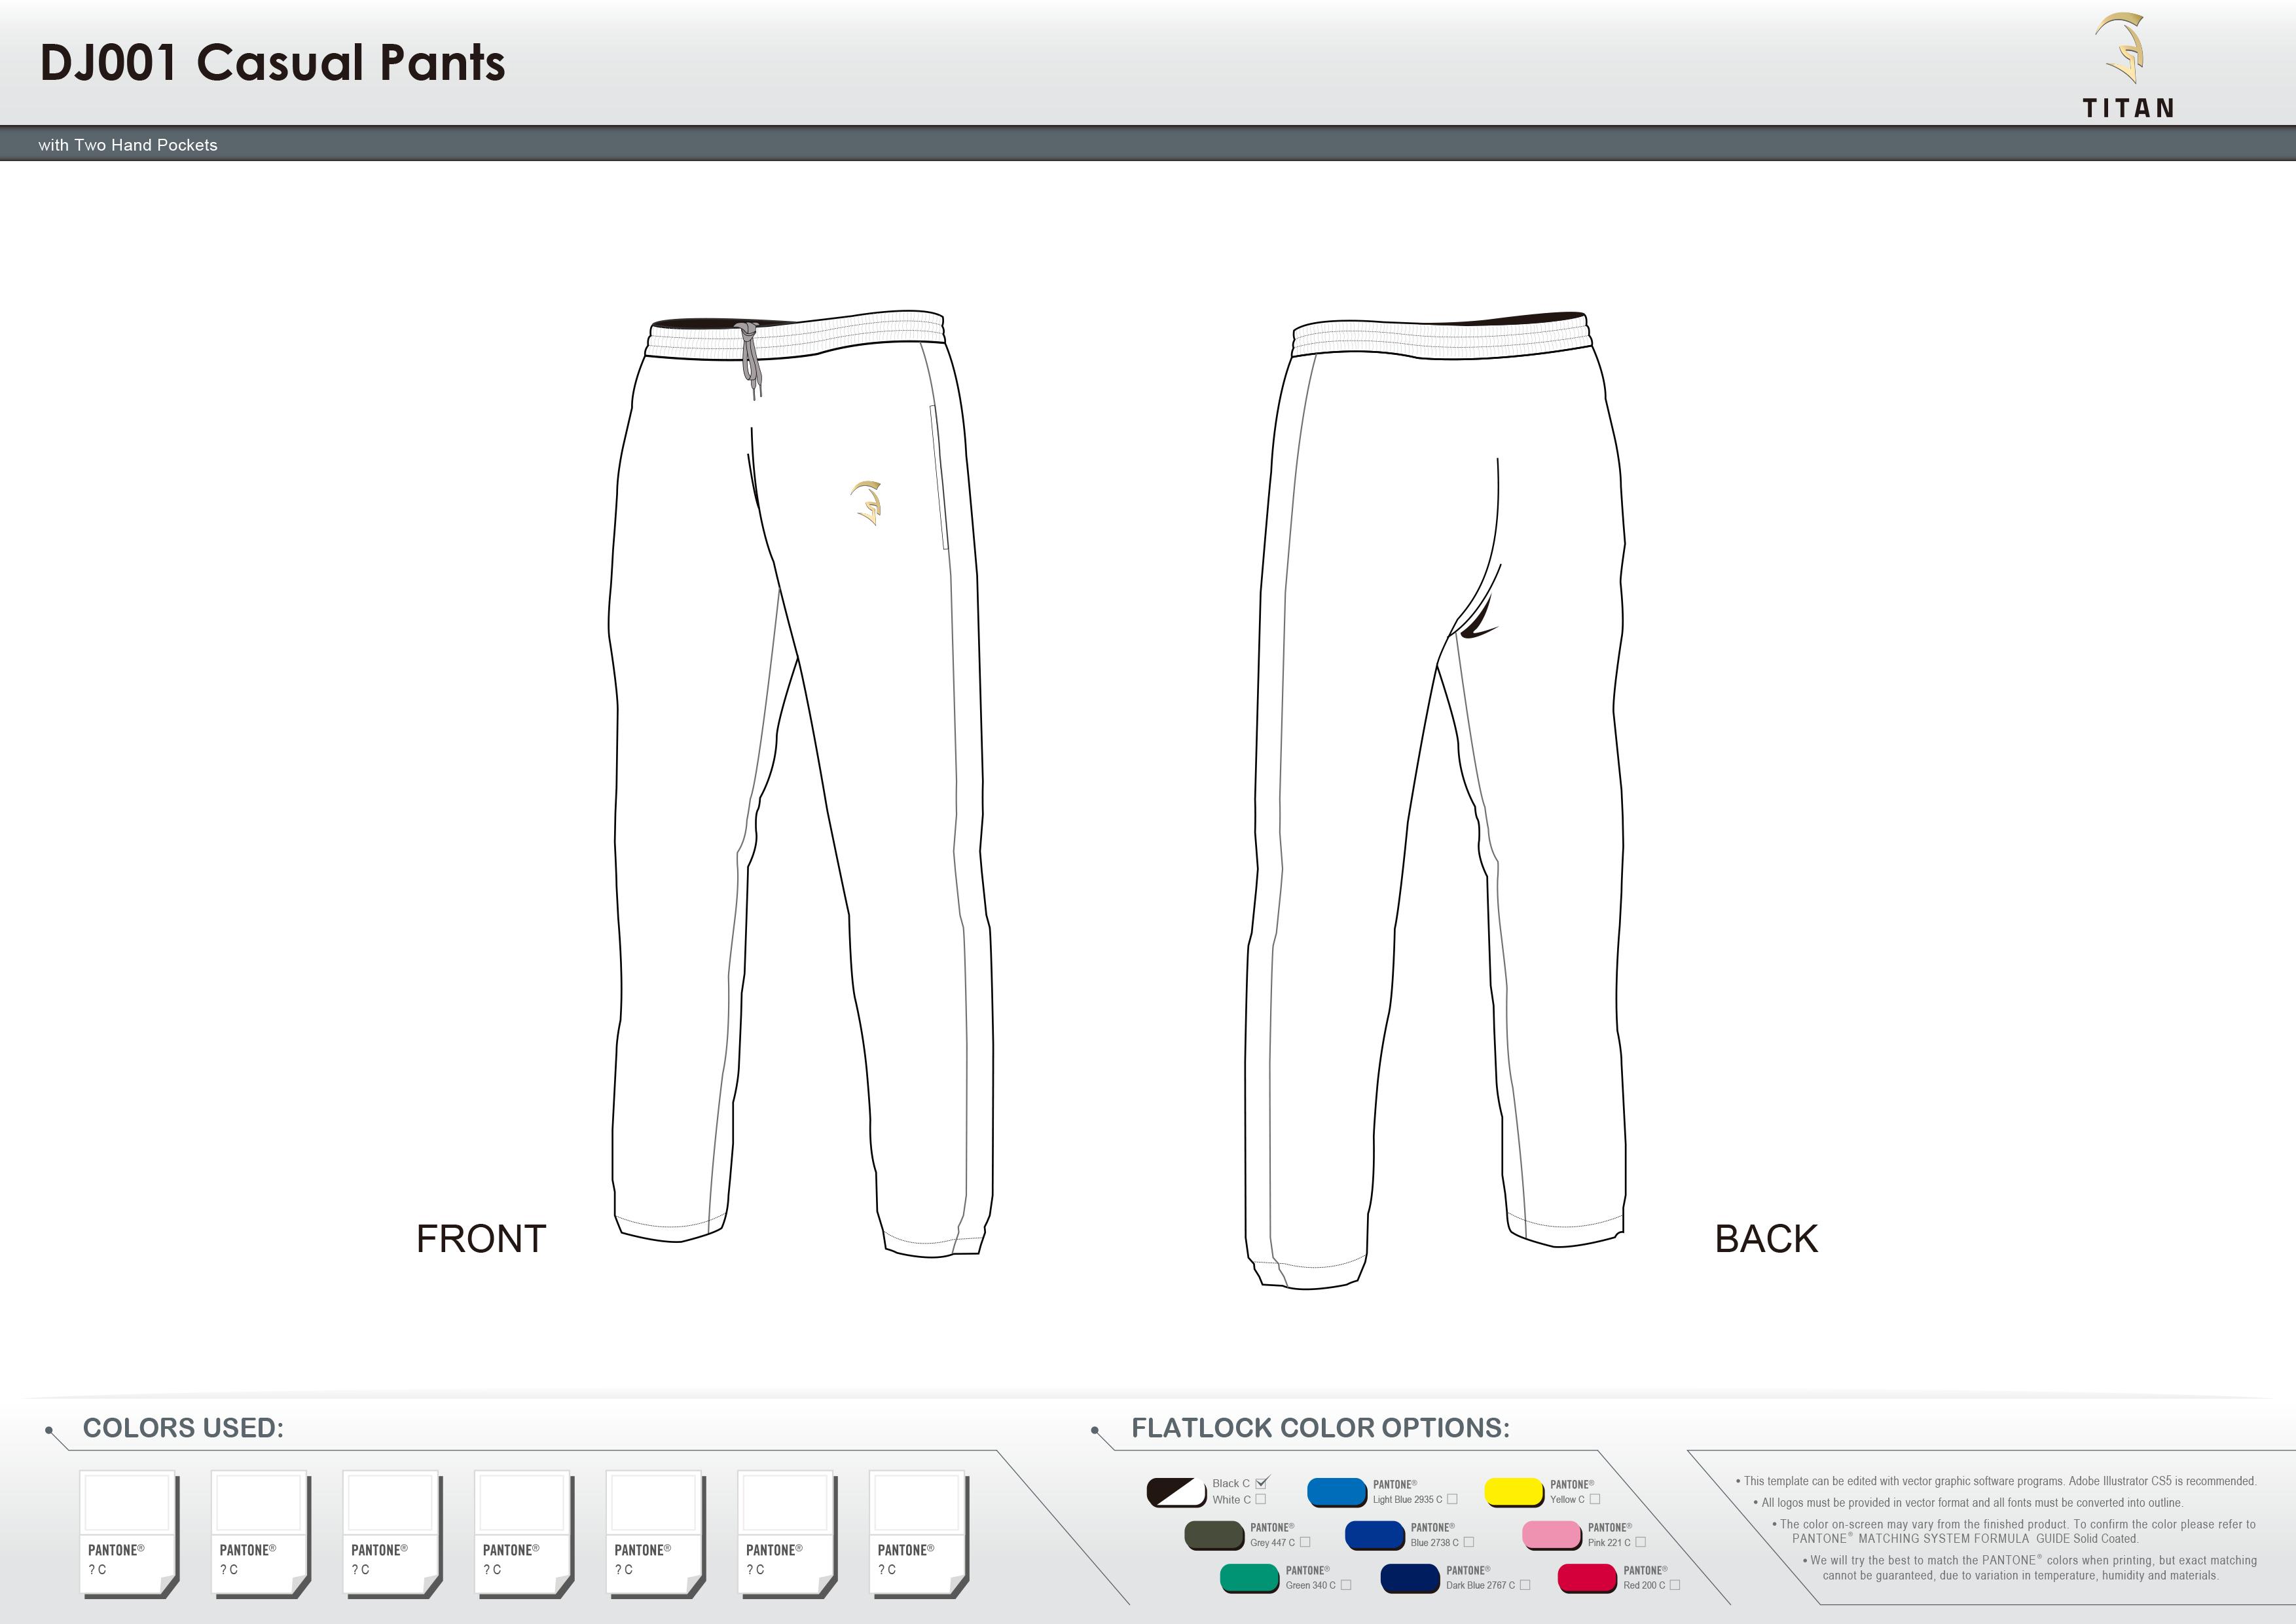 DJ001 Casual Pants